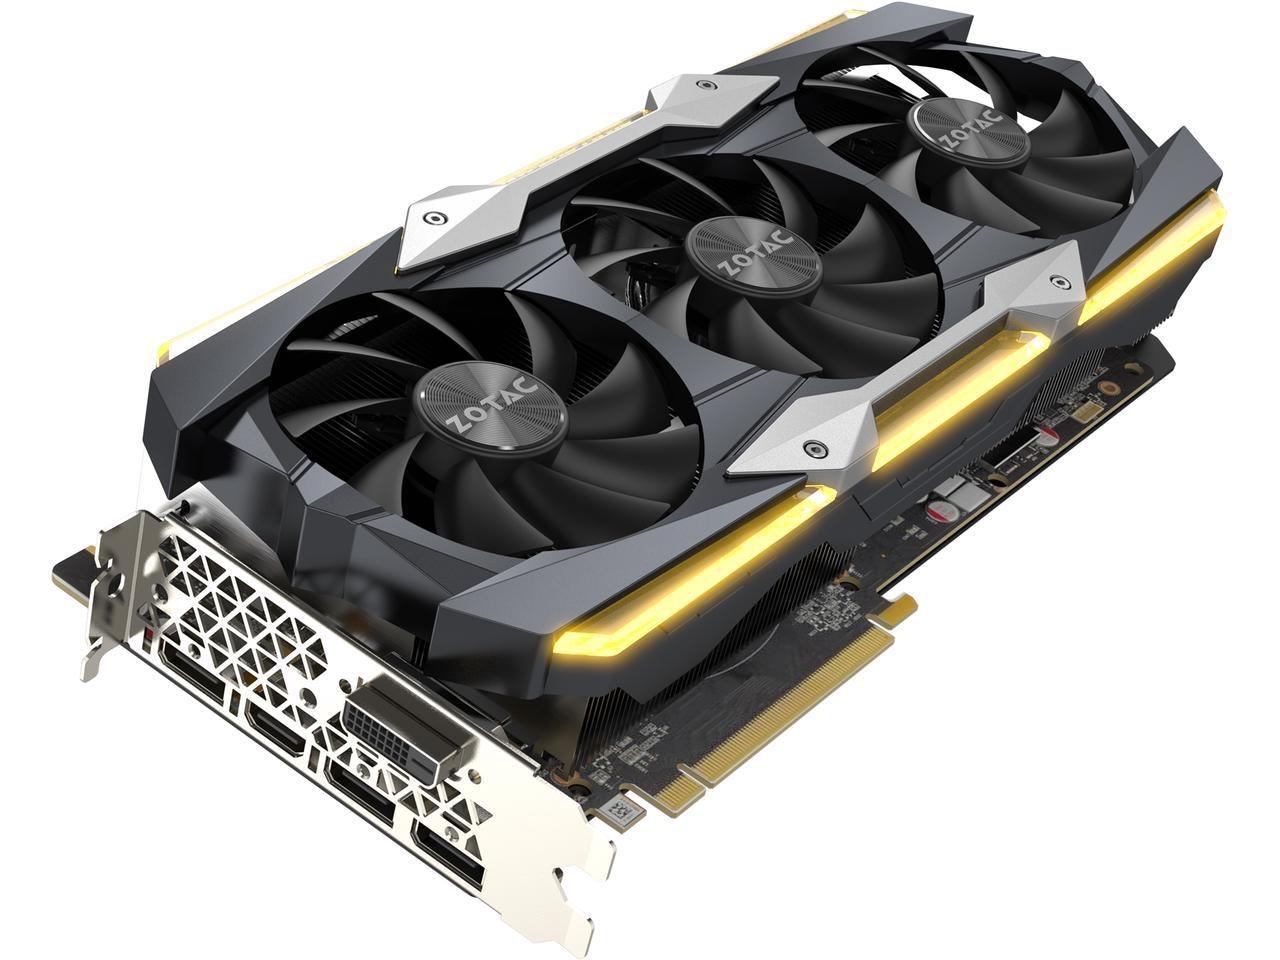 ZOTAC GeForce GTX 1080 Ti AMP Extreme 11GB GDDR5X 352-bit Gaming Graphics Card V